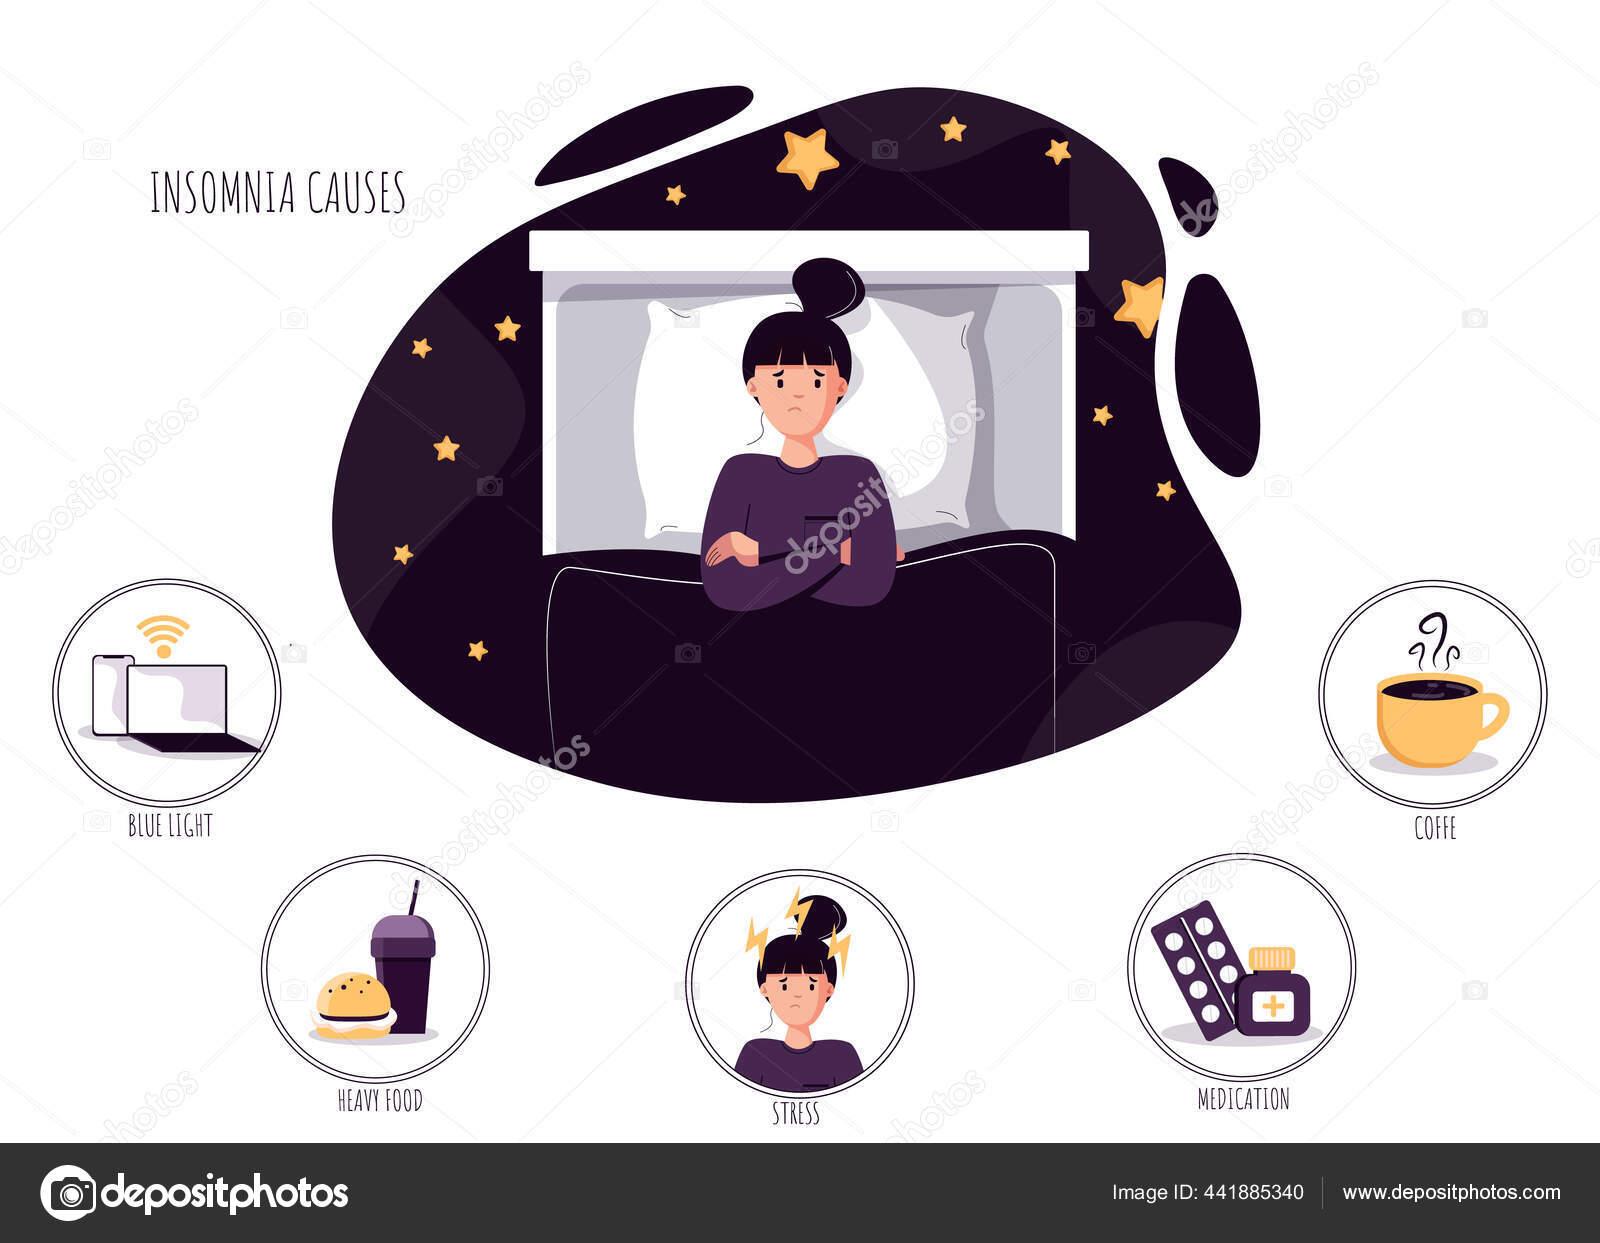 Womans Insomnia Berbaring Di Tempat Tidur Di Malam Hari Lelah Manusia Menderita Gangguan Tidur Insomnia Mimpi Buruk Kurang Tidur Stok Vektor C Shynkevich91 Gmail Com 441885340